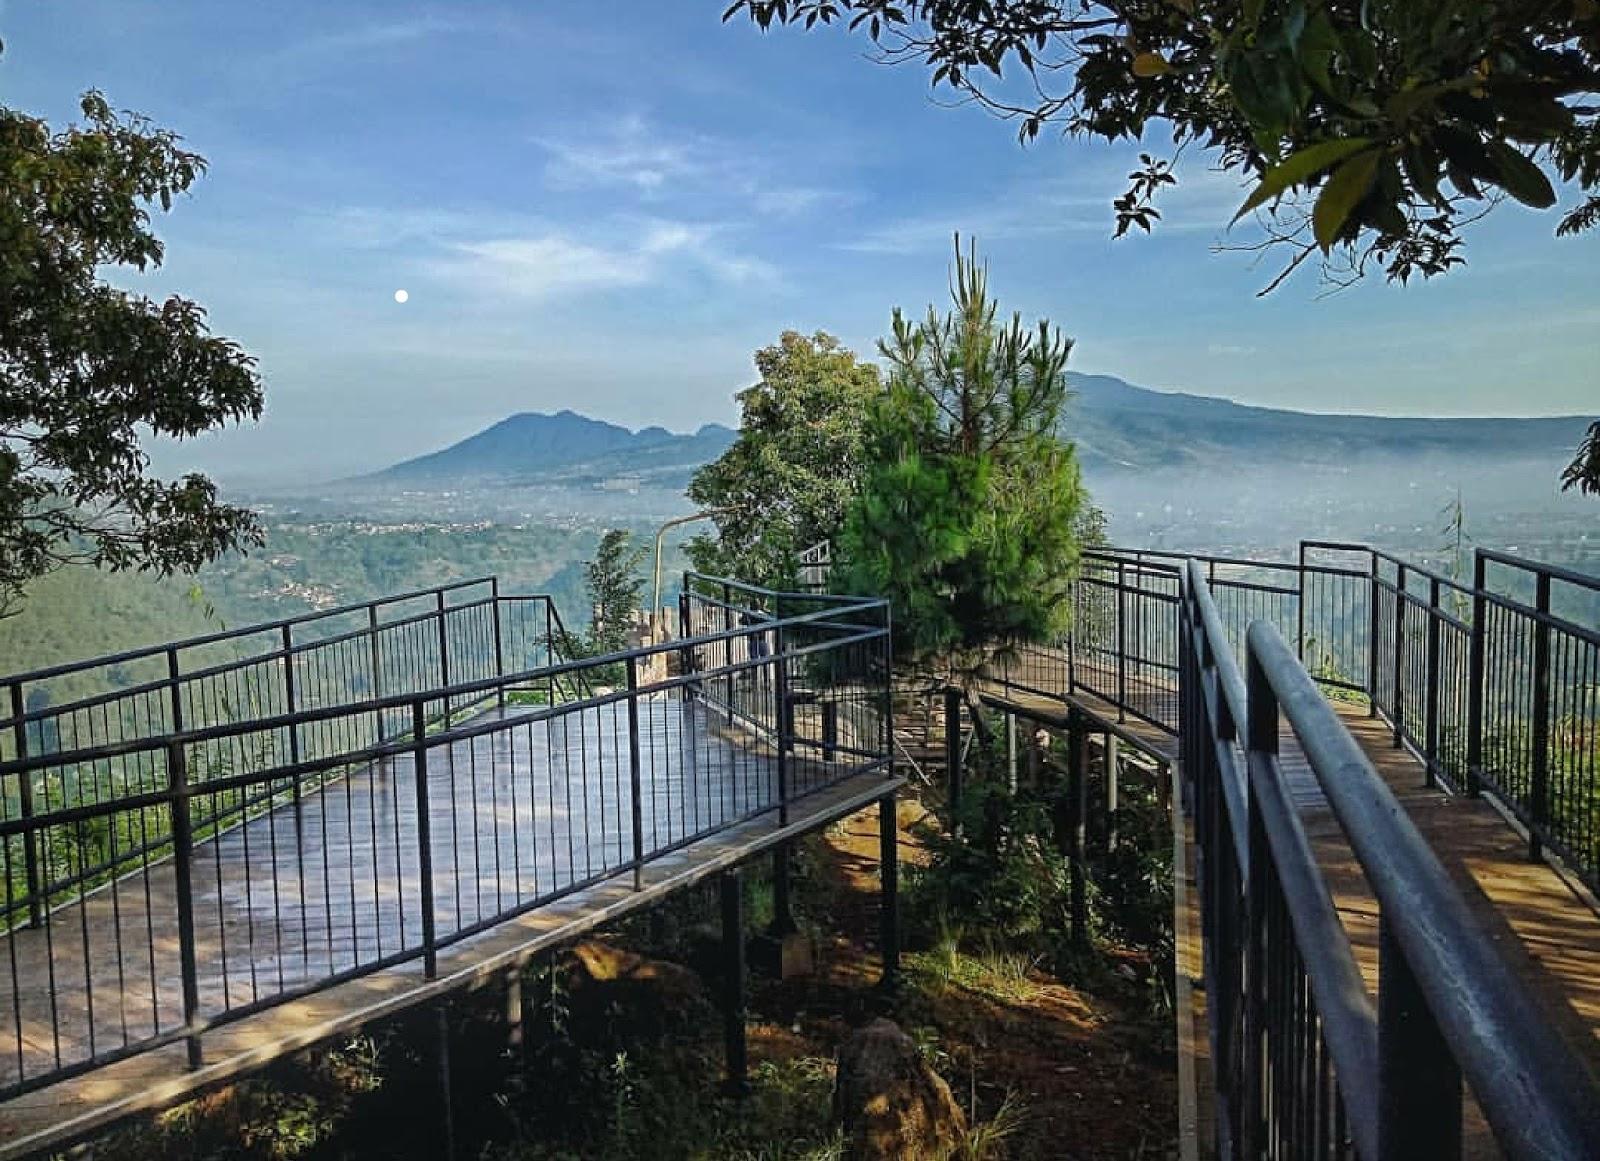 45 Tempat Wisata di Bandung Yang Wajib Anda Kunjungi dan Fotonya